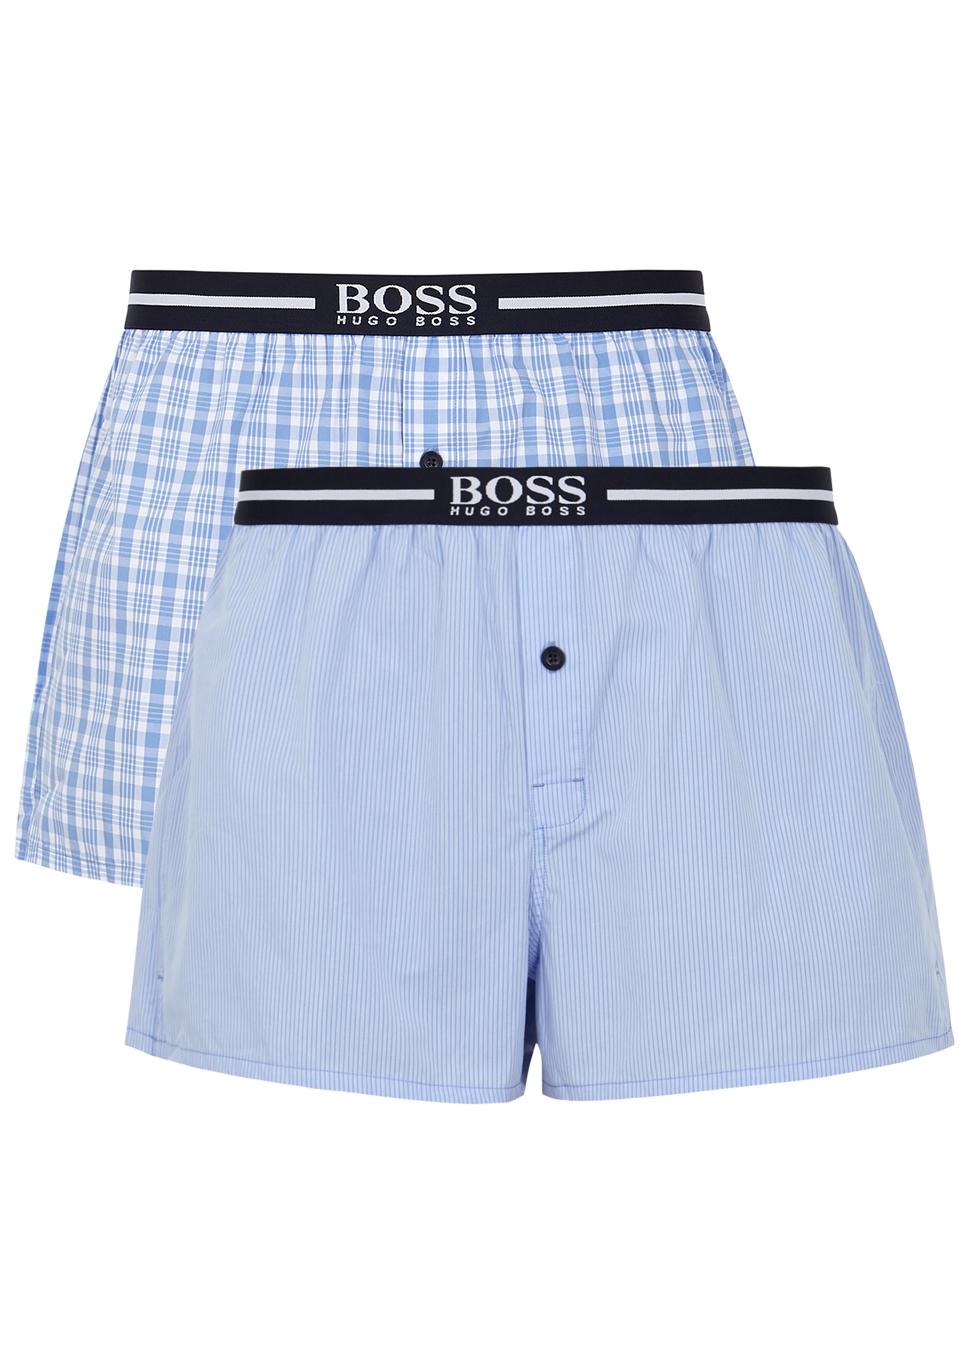 Cotton boxer shorts - set of two